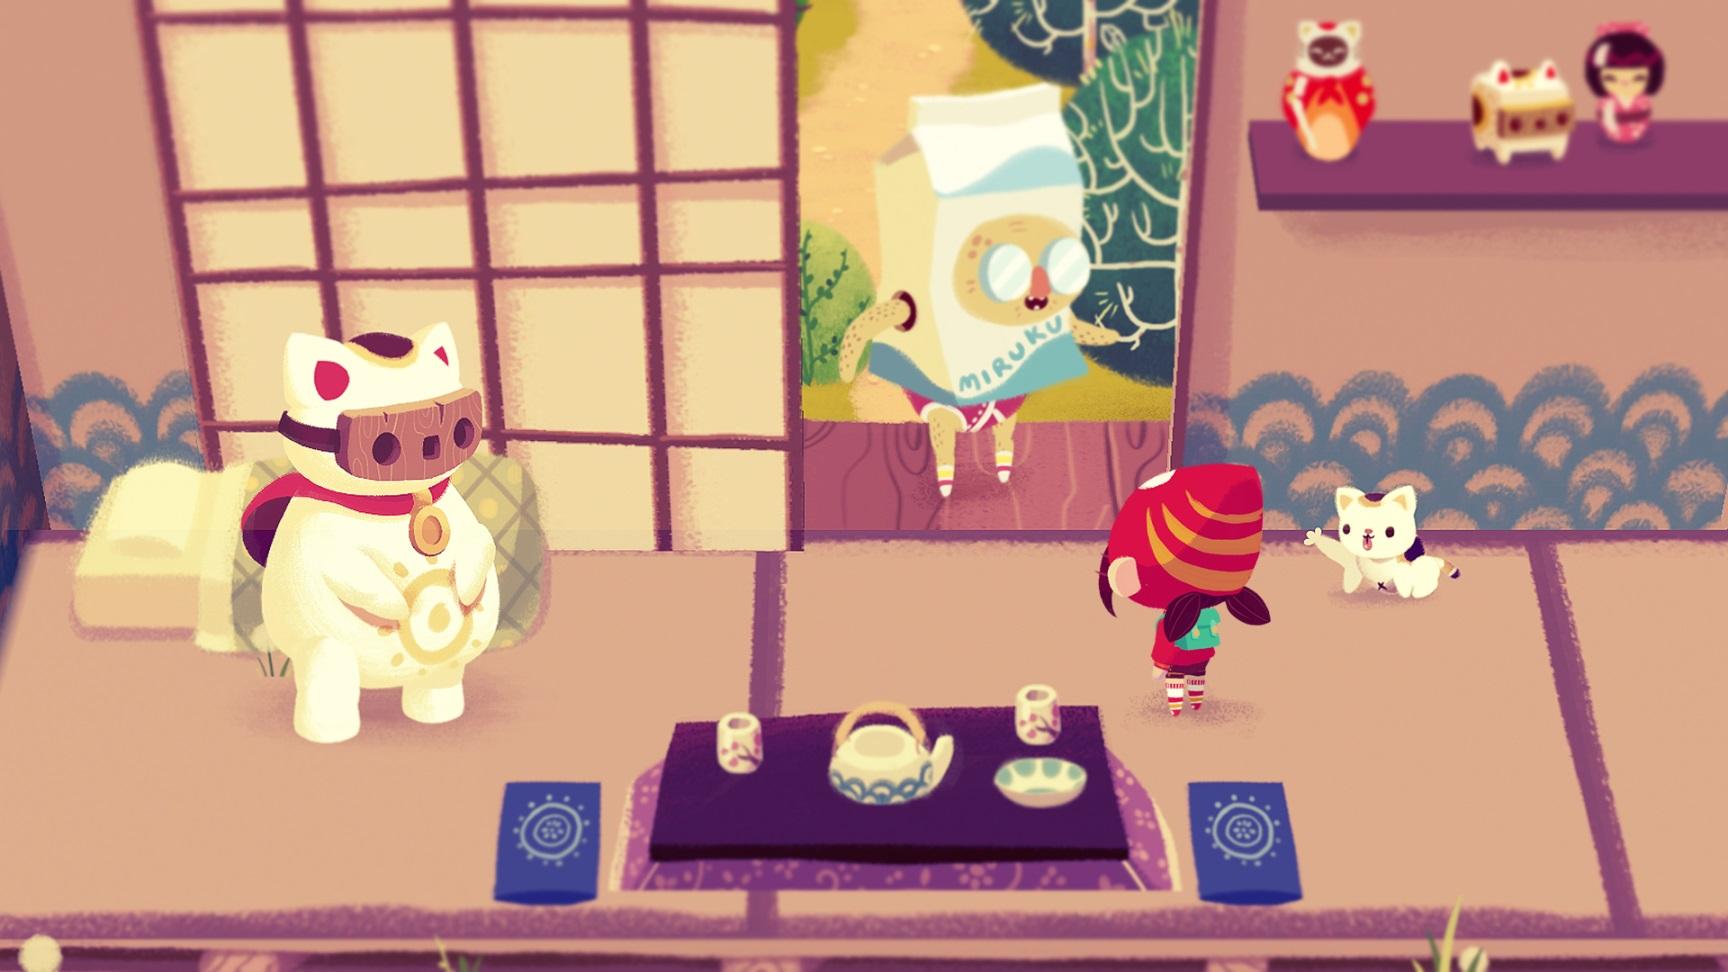 Mineko's Night Market, Meowza Games, Indie Game, cats, Nintendo Switch